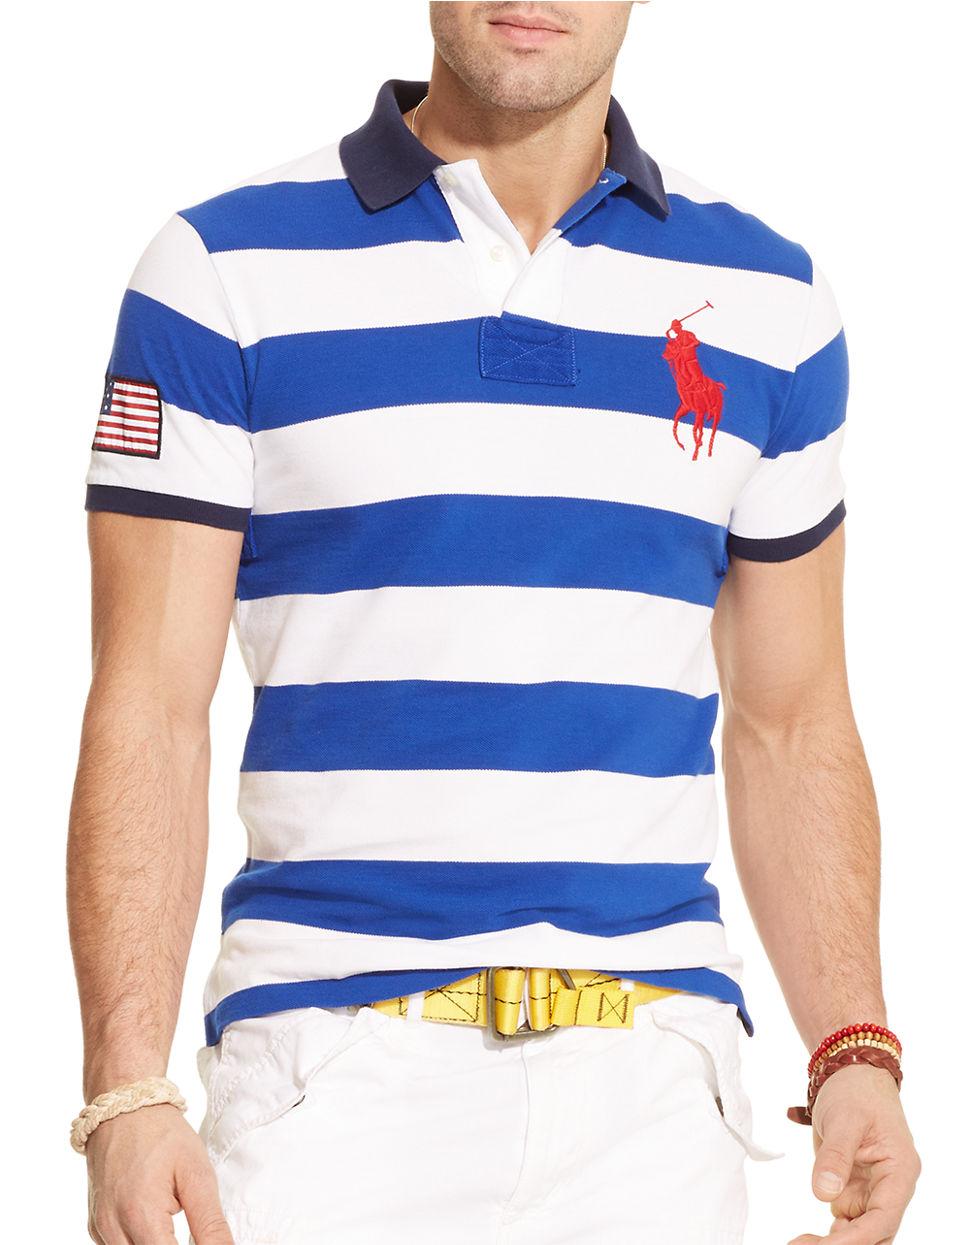 Polo ralph lauren custom fit striped mesh polo shirt in for Polo ralph lauren custom fit polo shirt